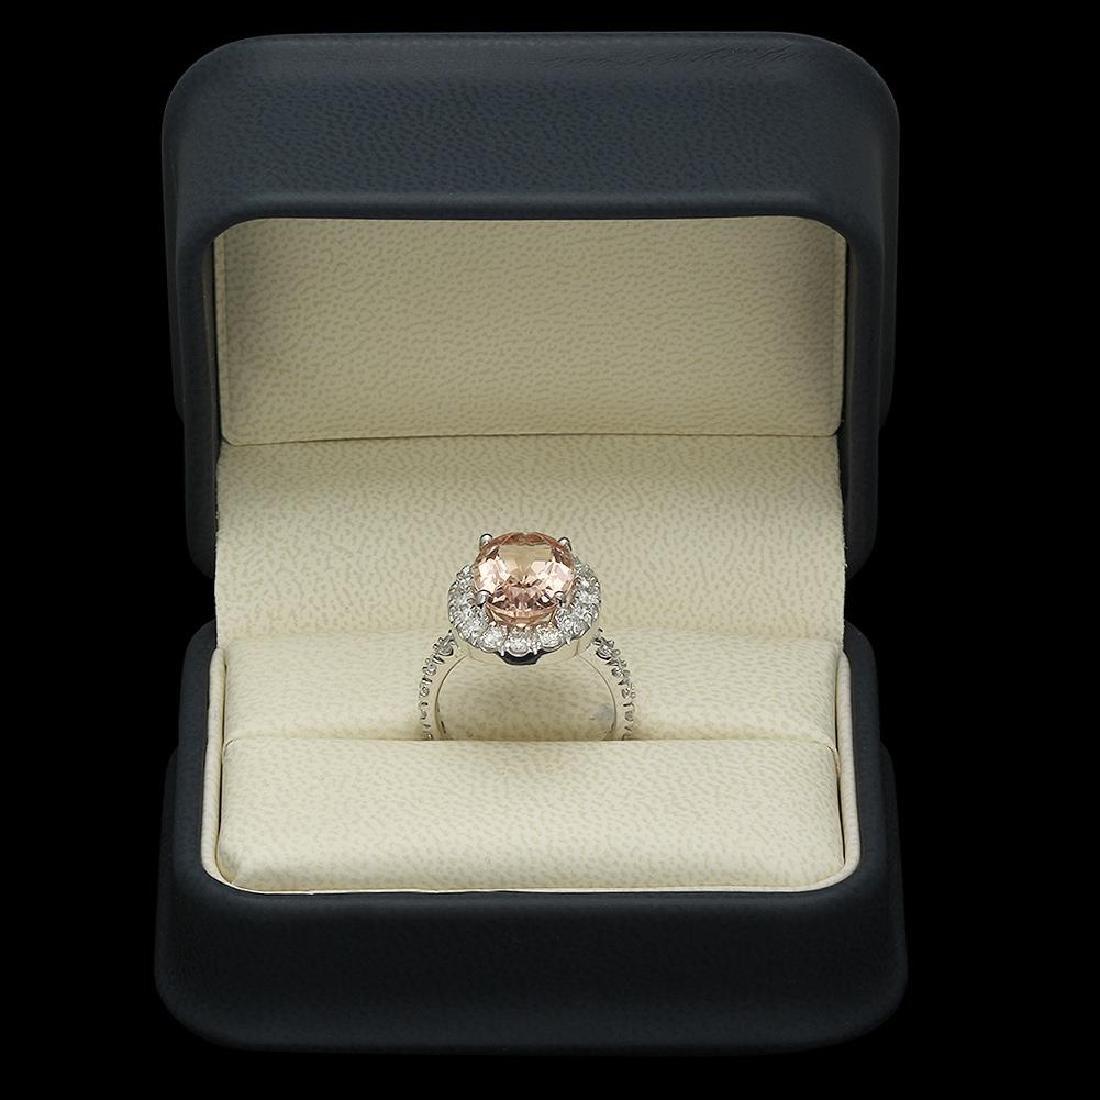 14K Gold 5.84ct Morganite 1.81ct Diamond Ring - 4